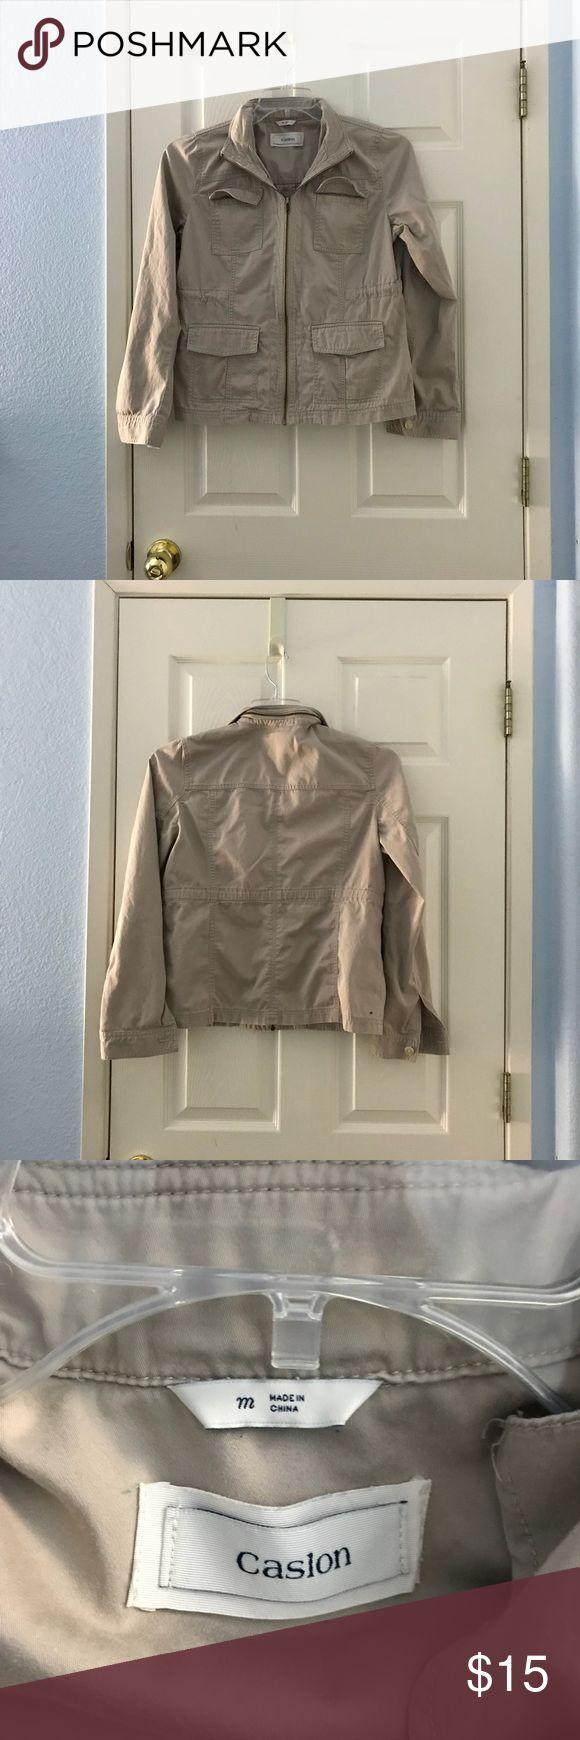 Women's Clothing Denim zip up jacket. Caslon Jackets & Coats Jean Jackets